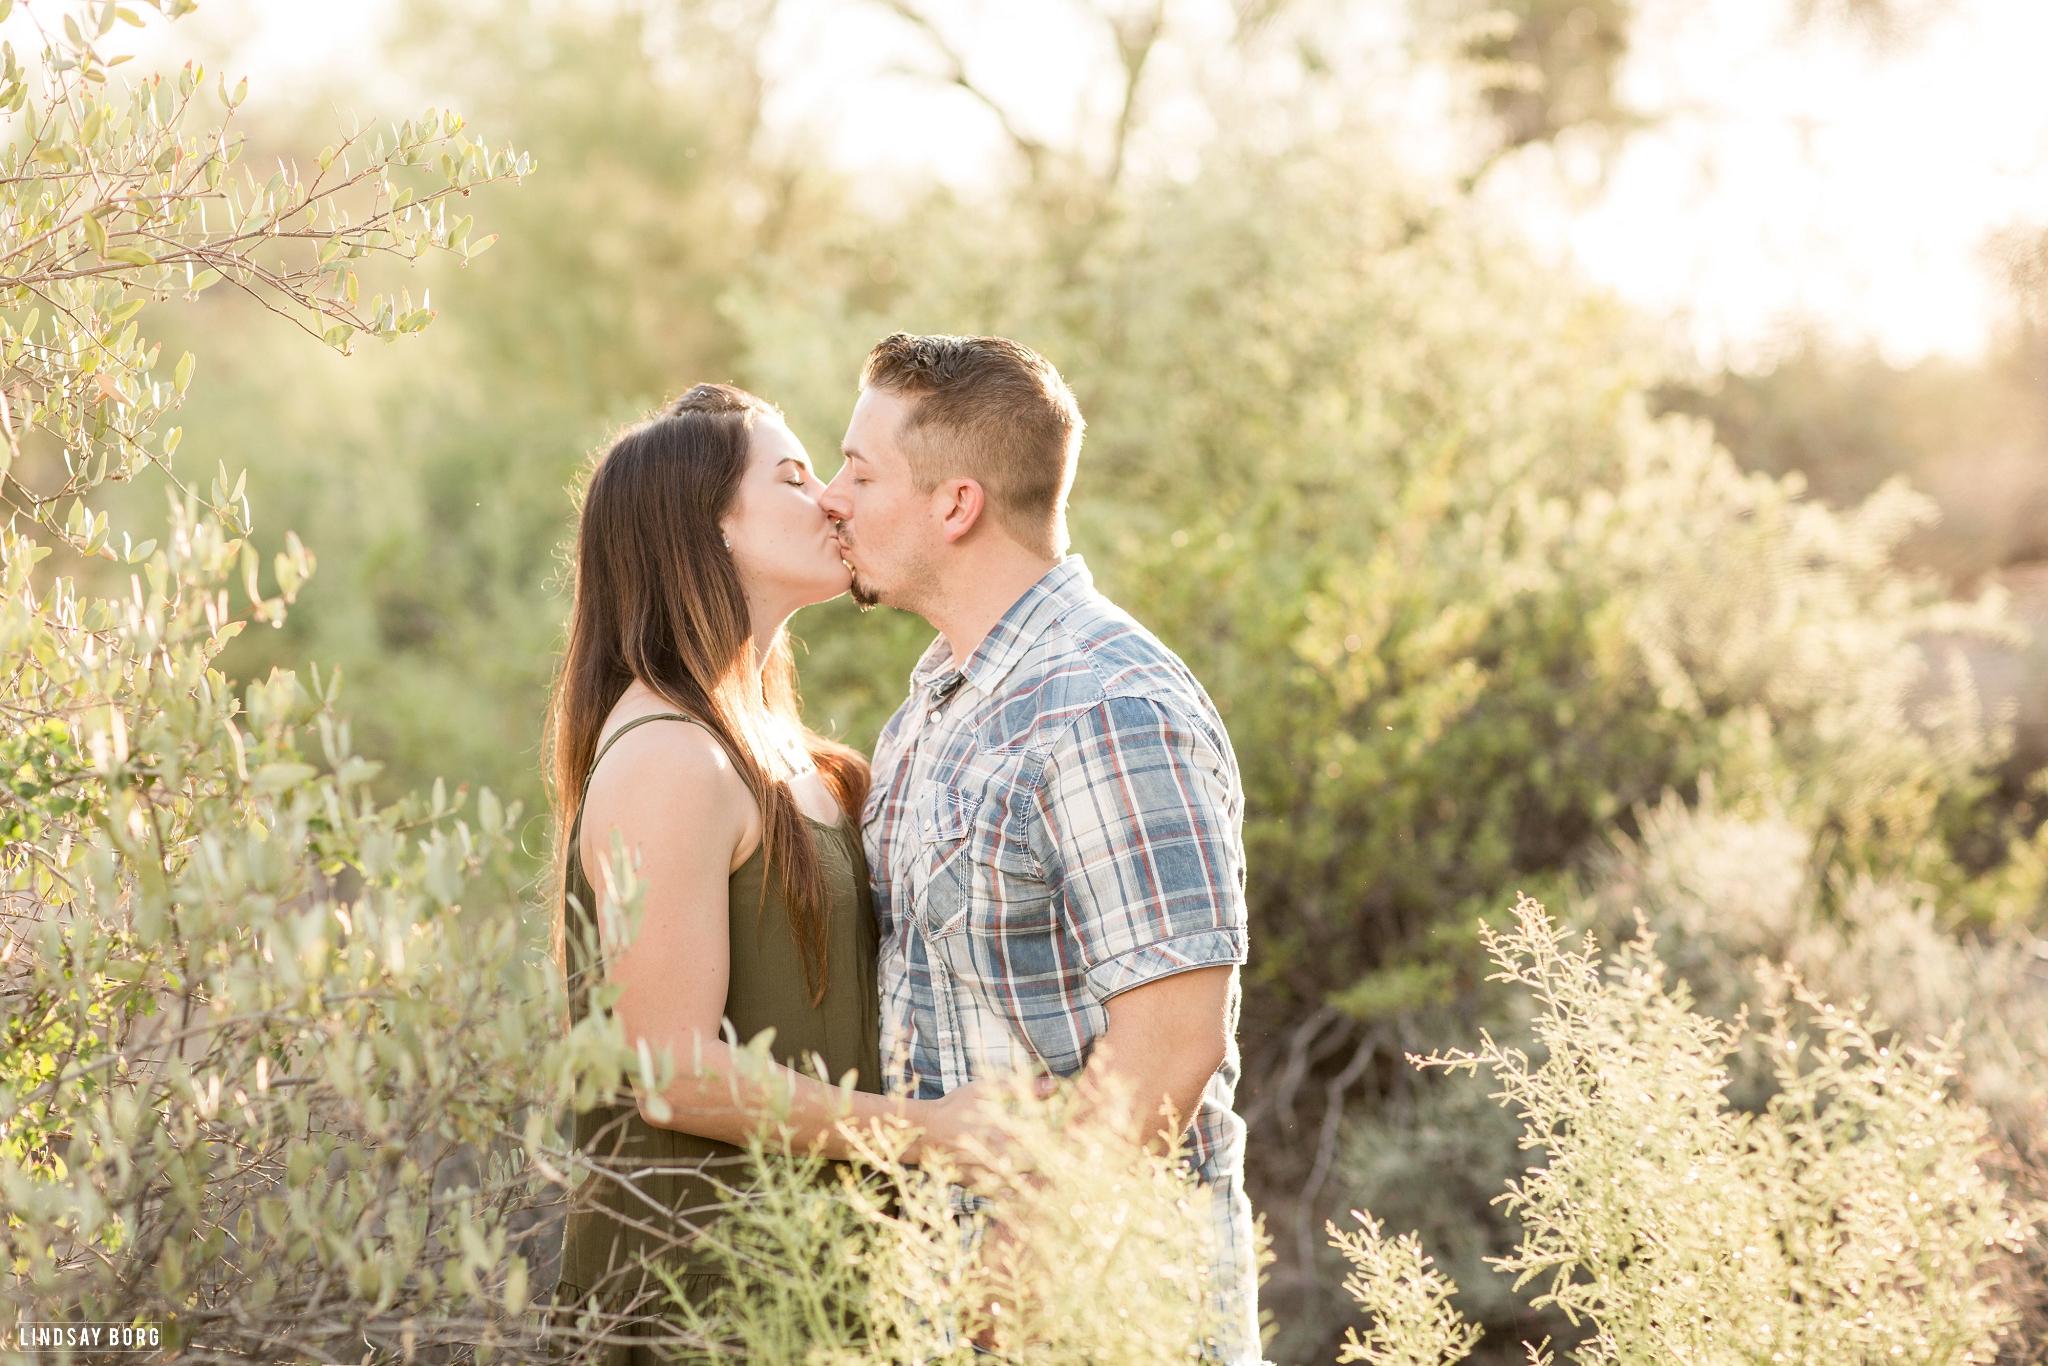 Lindsay-Borg-Photography-Arizona-engagement-photographer-lost-dutchman (3).jpg